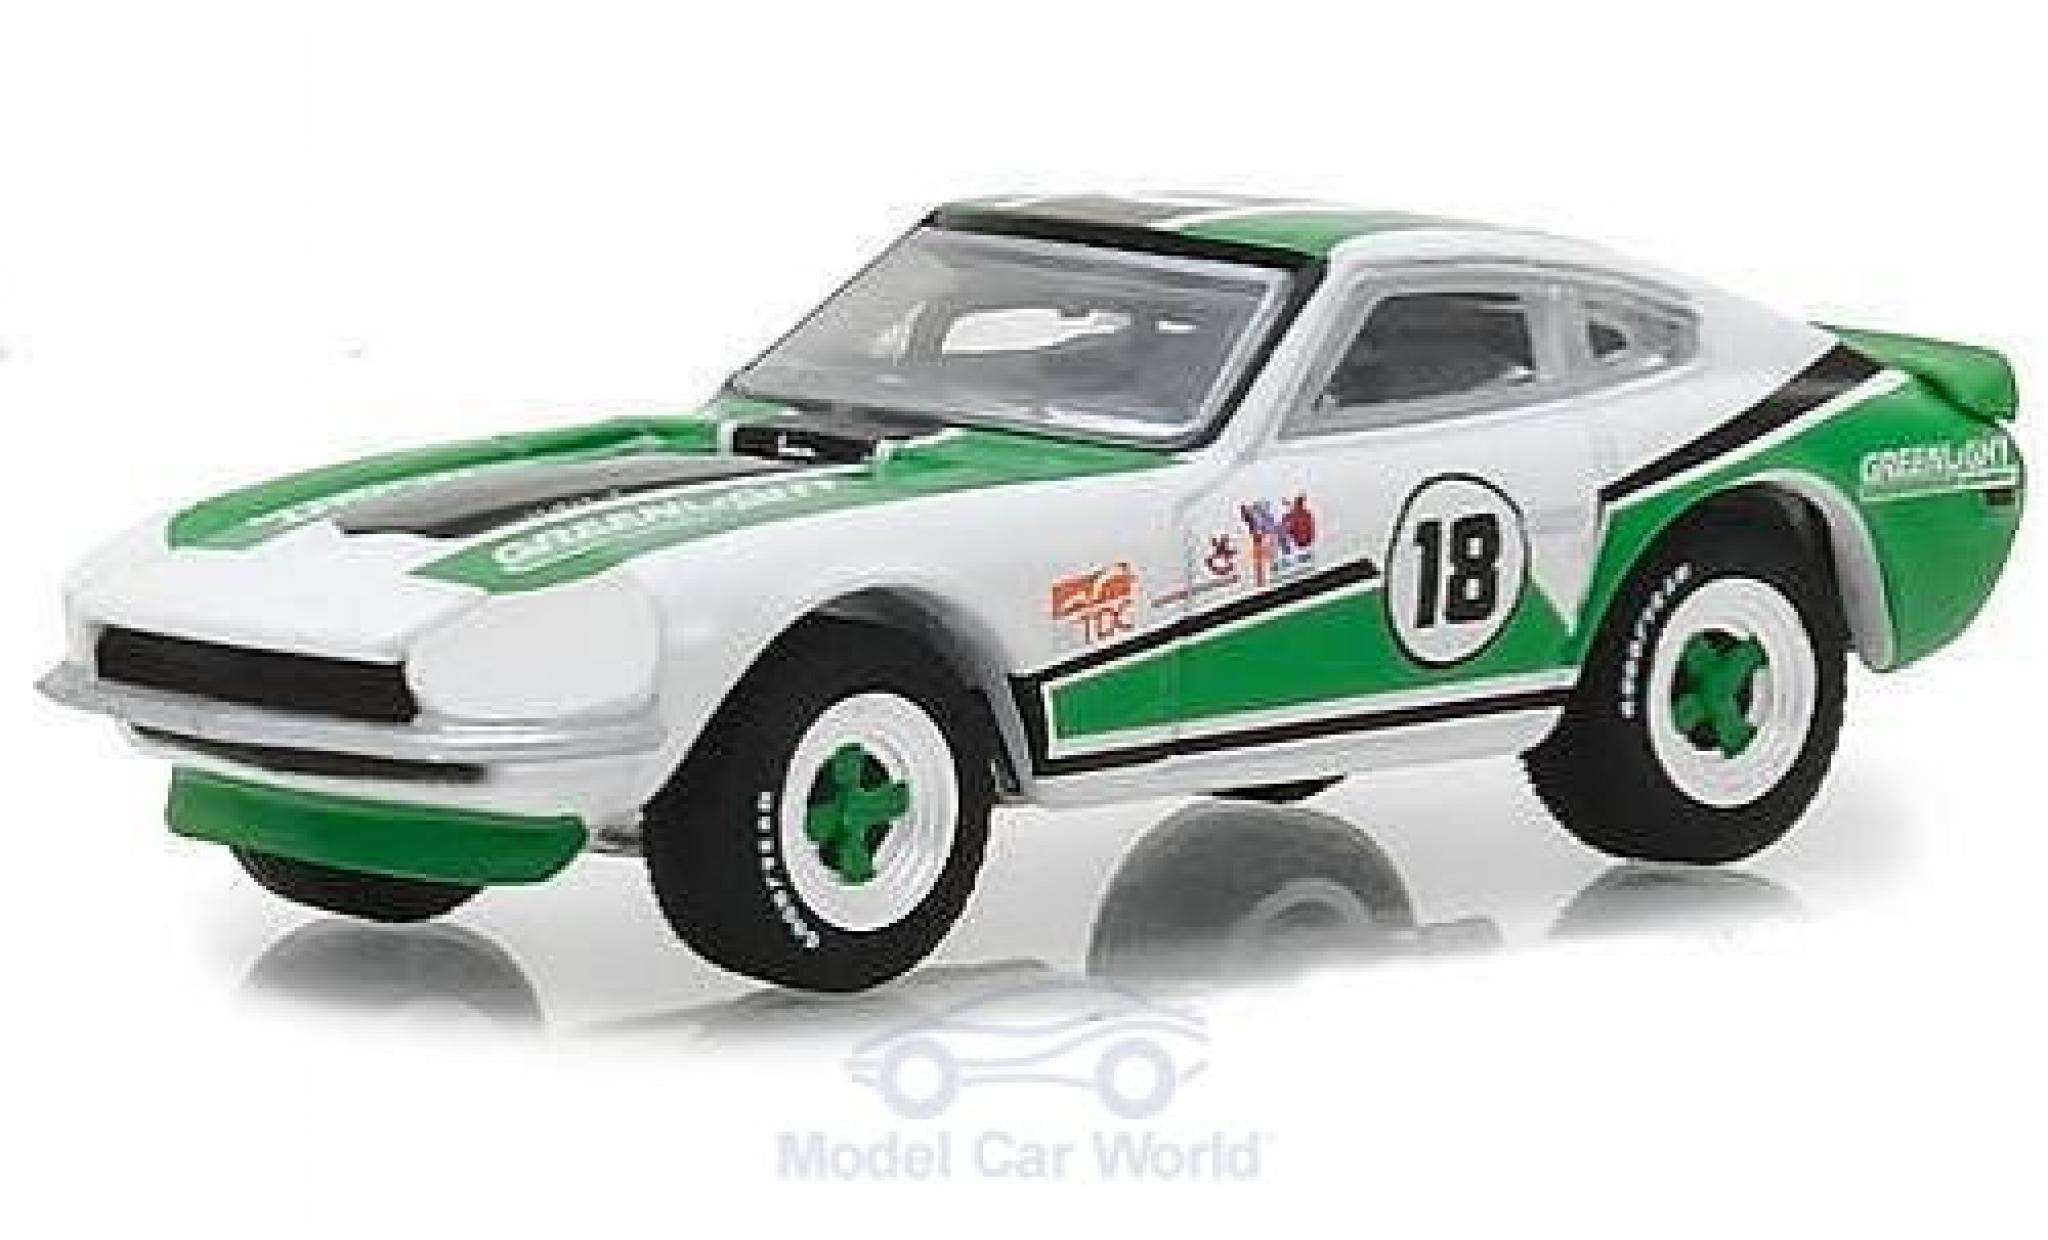 Datsun 240Z 1/64 Greenlight verte/blanche No.18 GreenLight Racing Team 1970